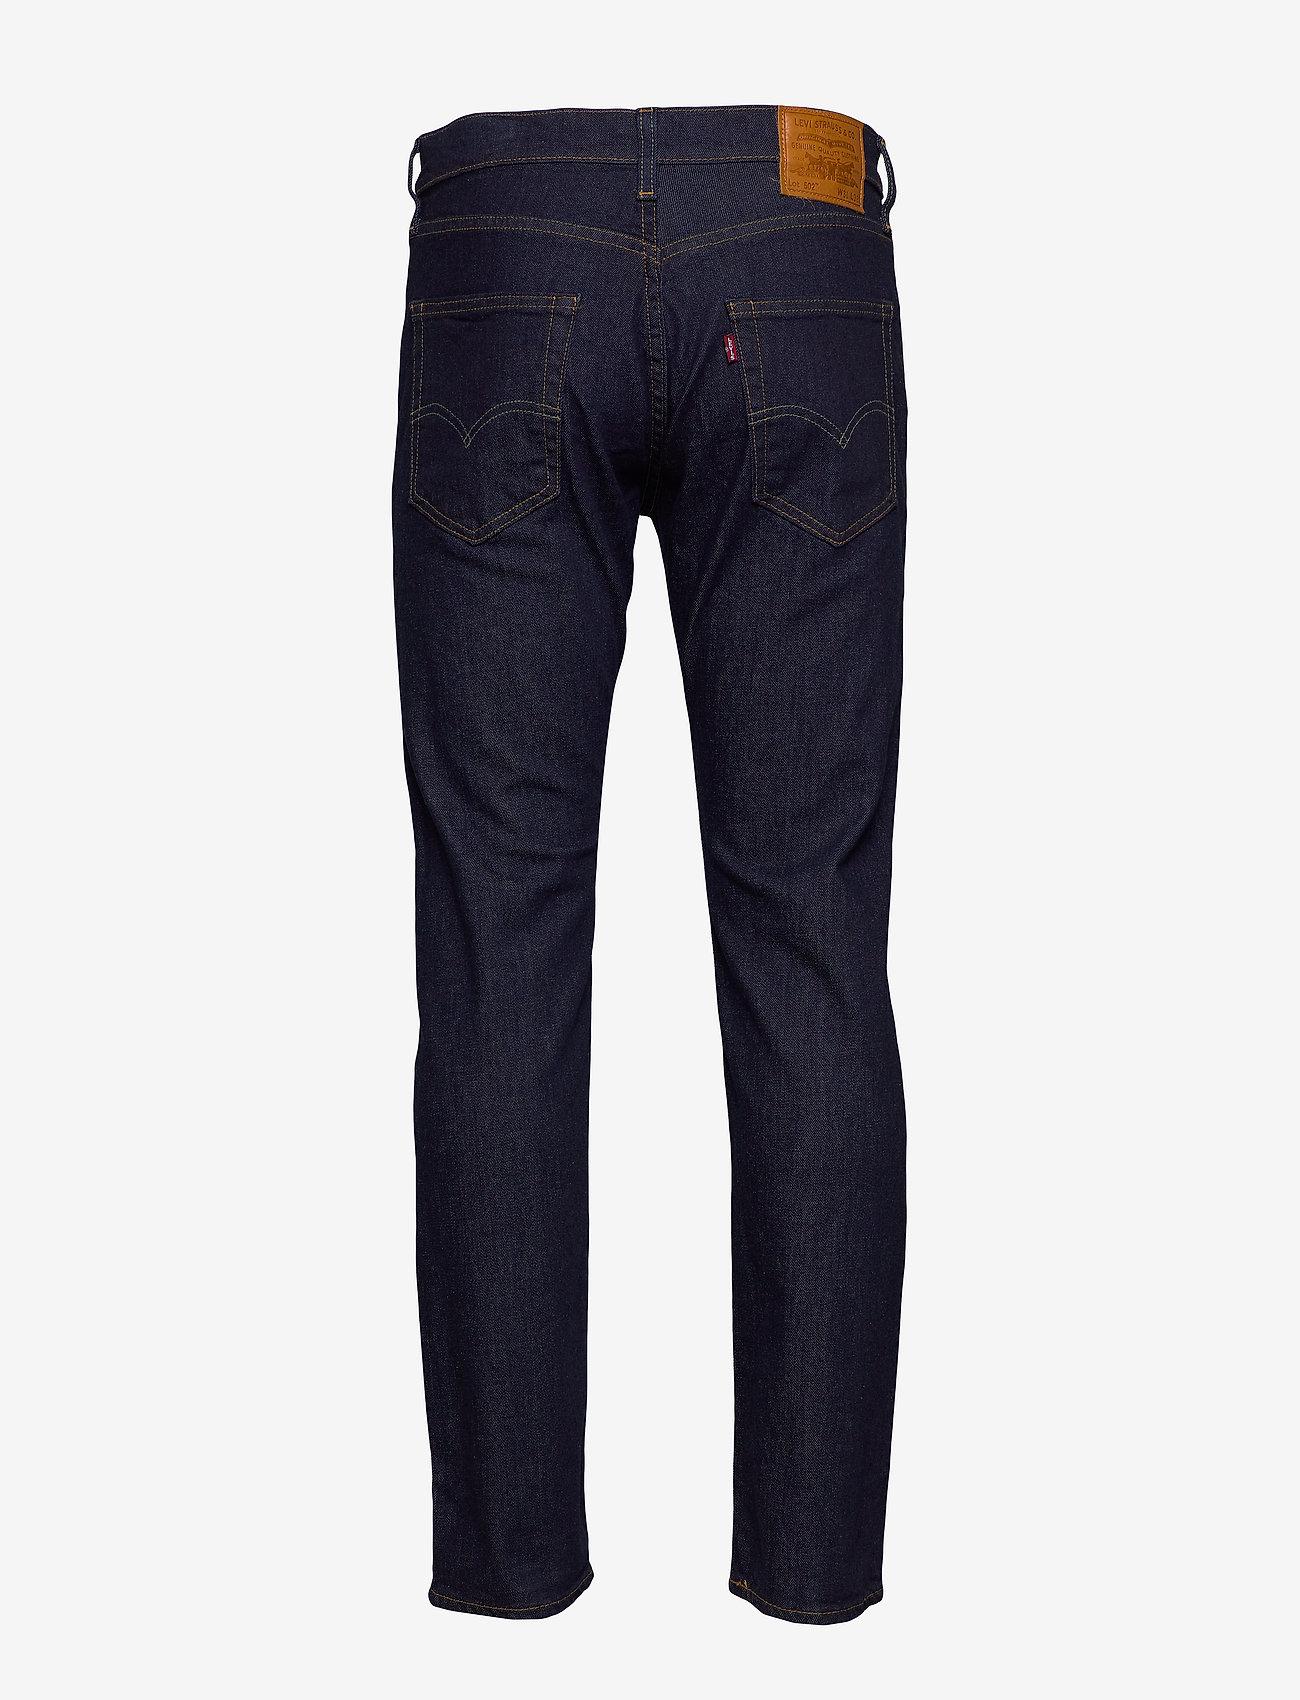 LEVI´S Men - 502 TAPER ROCK COD - slim jeans - dark indigo - flat finish - 1